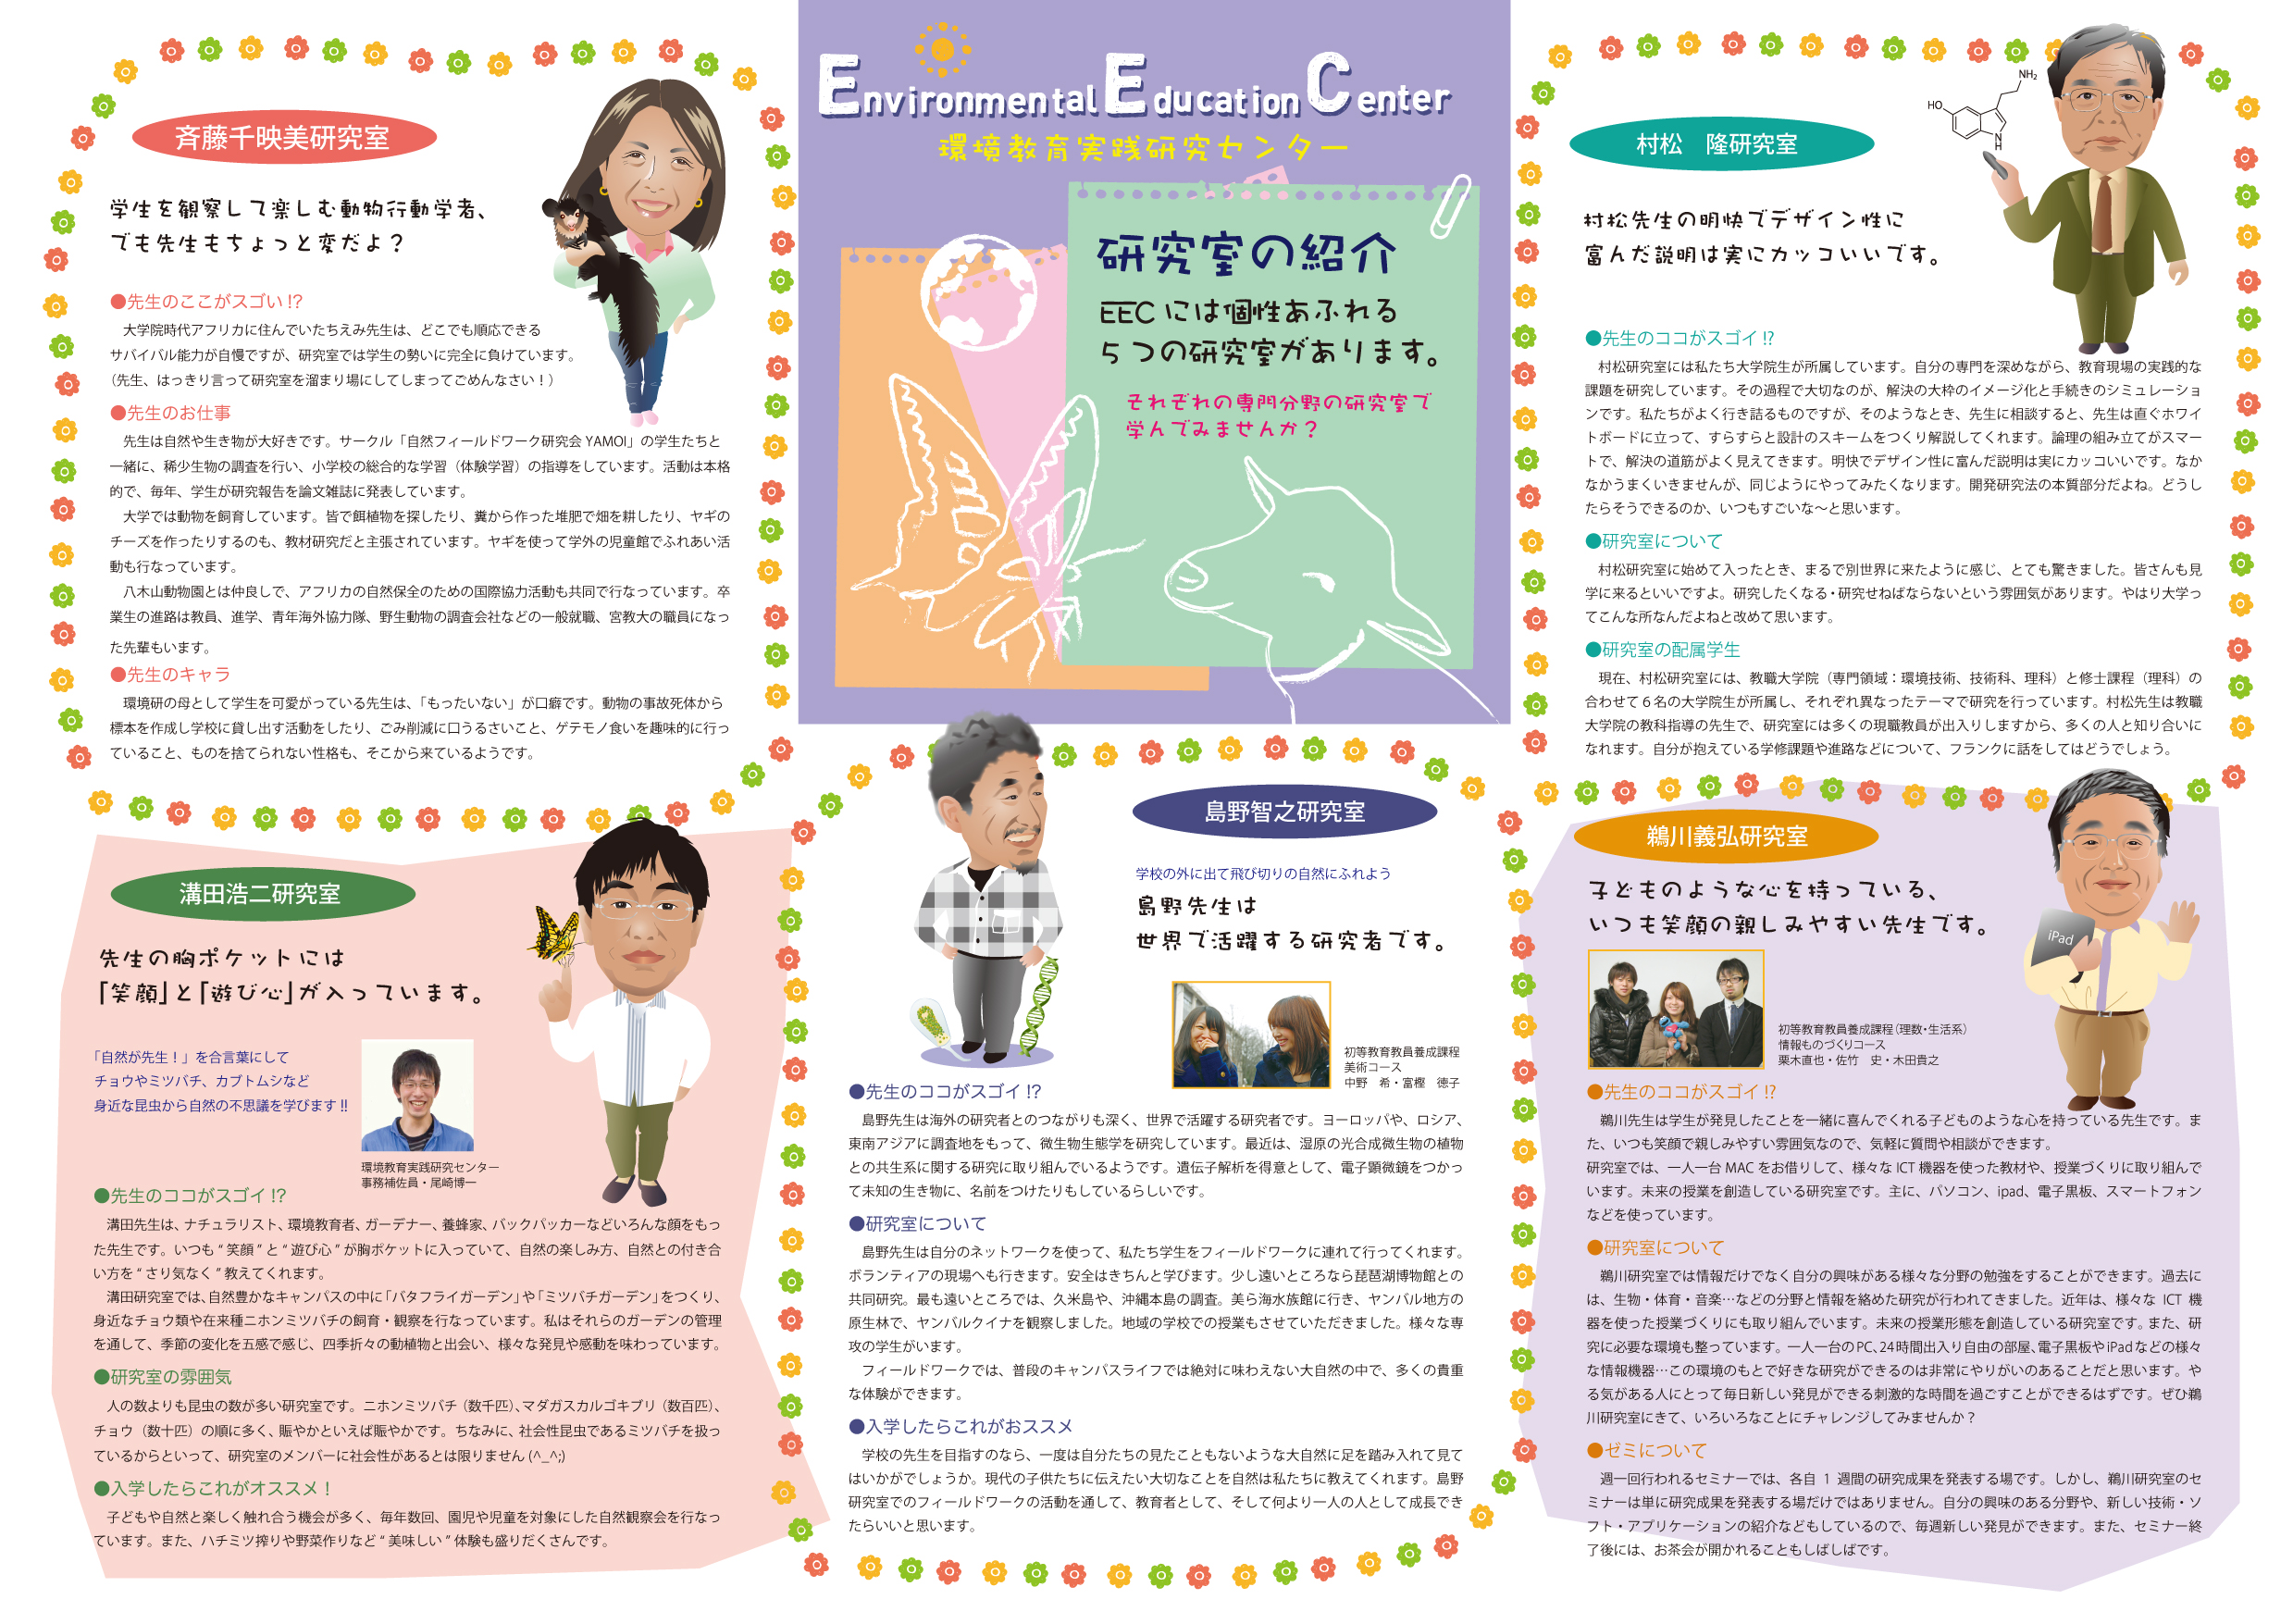 http://www.eec.miyakyo-u.ac.jp/blog/EEC%E3%83%8F%E3%82%9A%E3%83%B3%E3%83%95%E4%B8%AD%E9%9D%A2.jpg